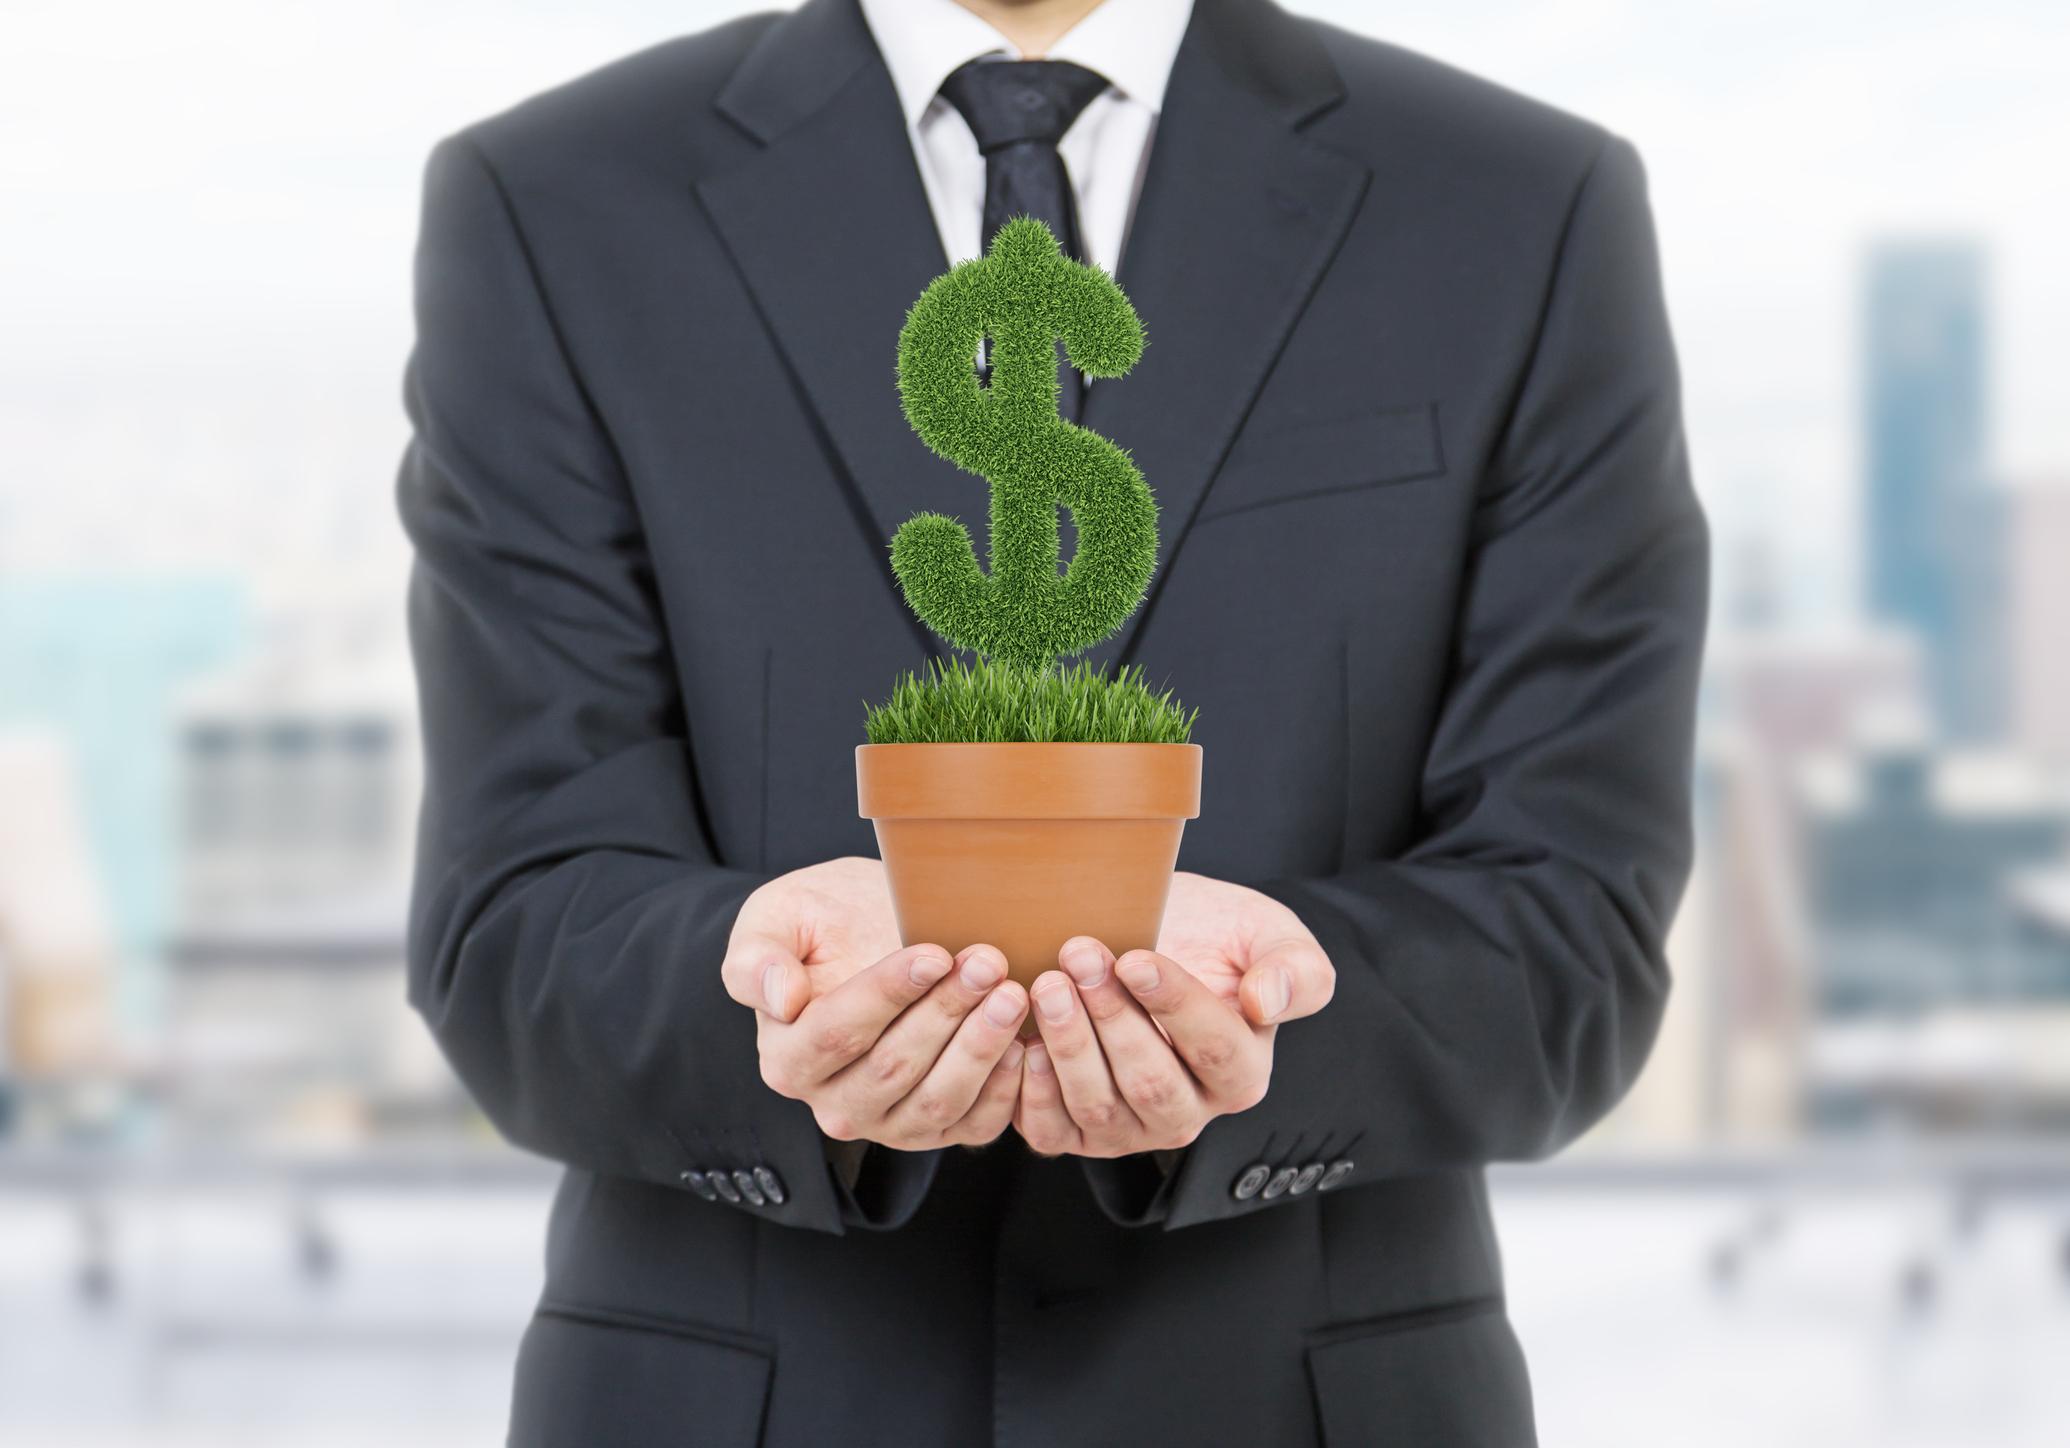 3 Stocks Robinhood Investors Should Buy With $1,000